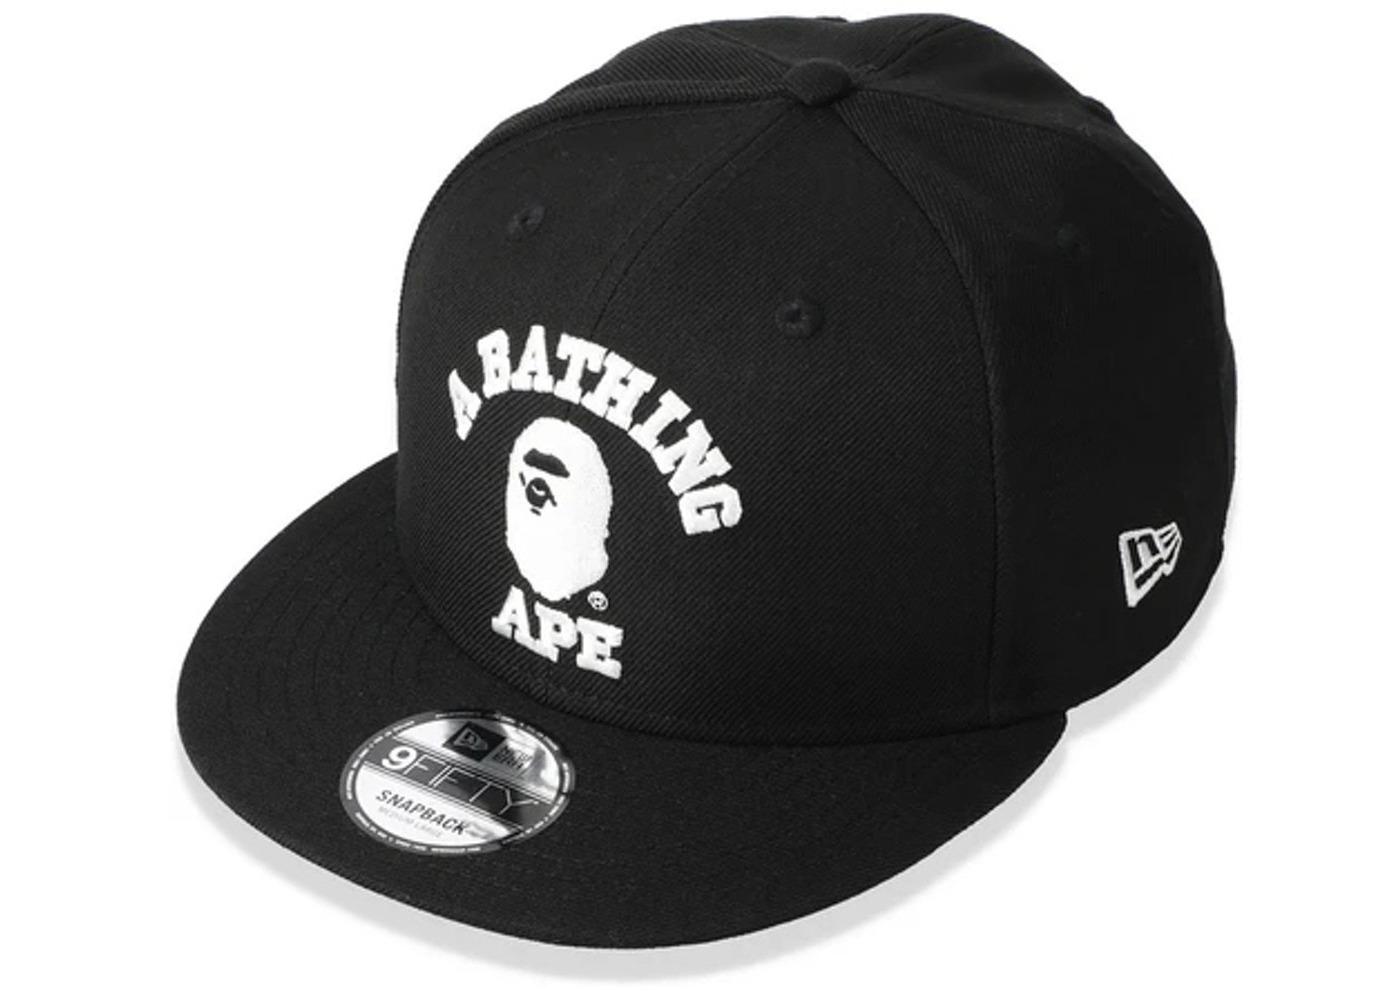 Bape College New Era Snapback Hat Black (SS21)の写真